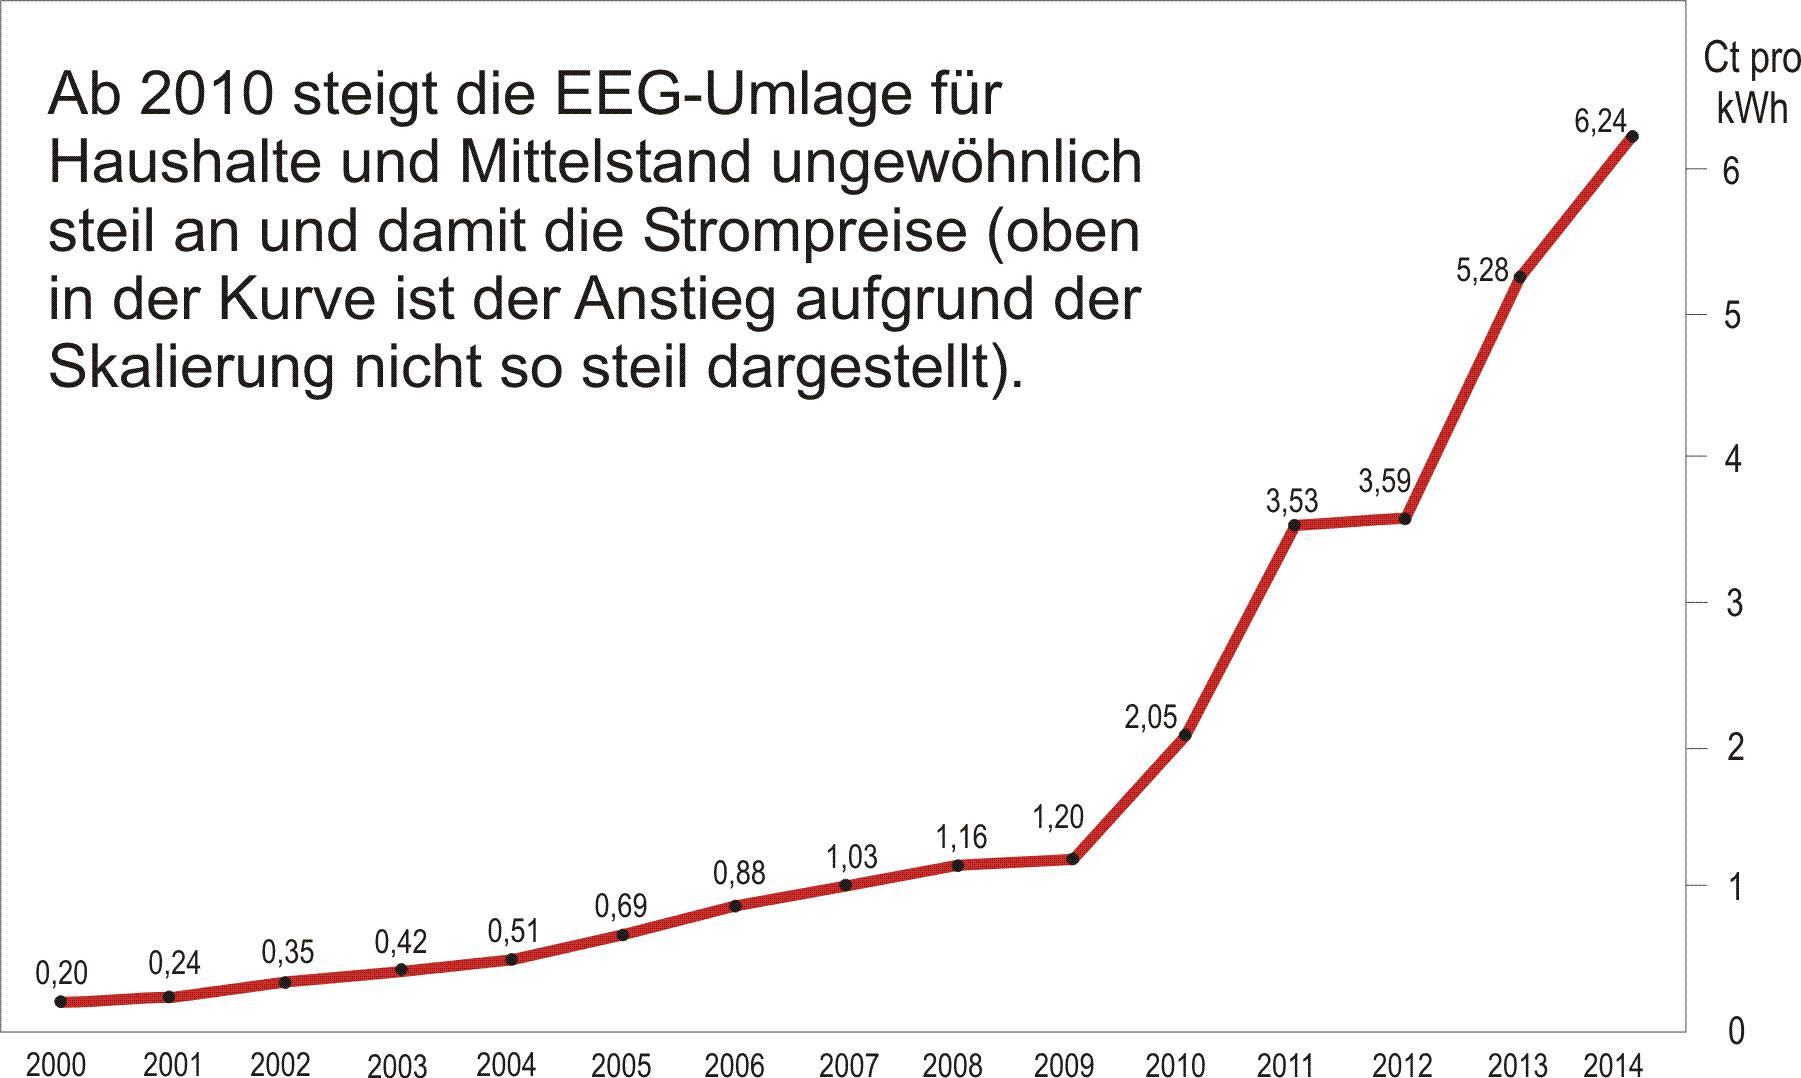 http://energiewende-rocken.org/wp-content/uploads/2015/08/EEG-Umlage.png